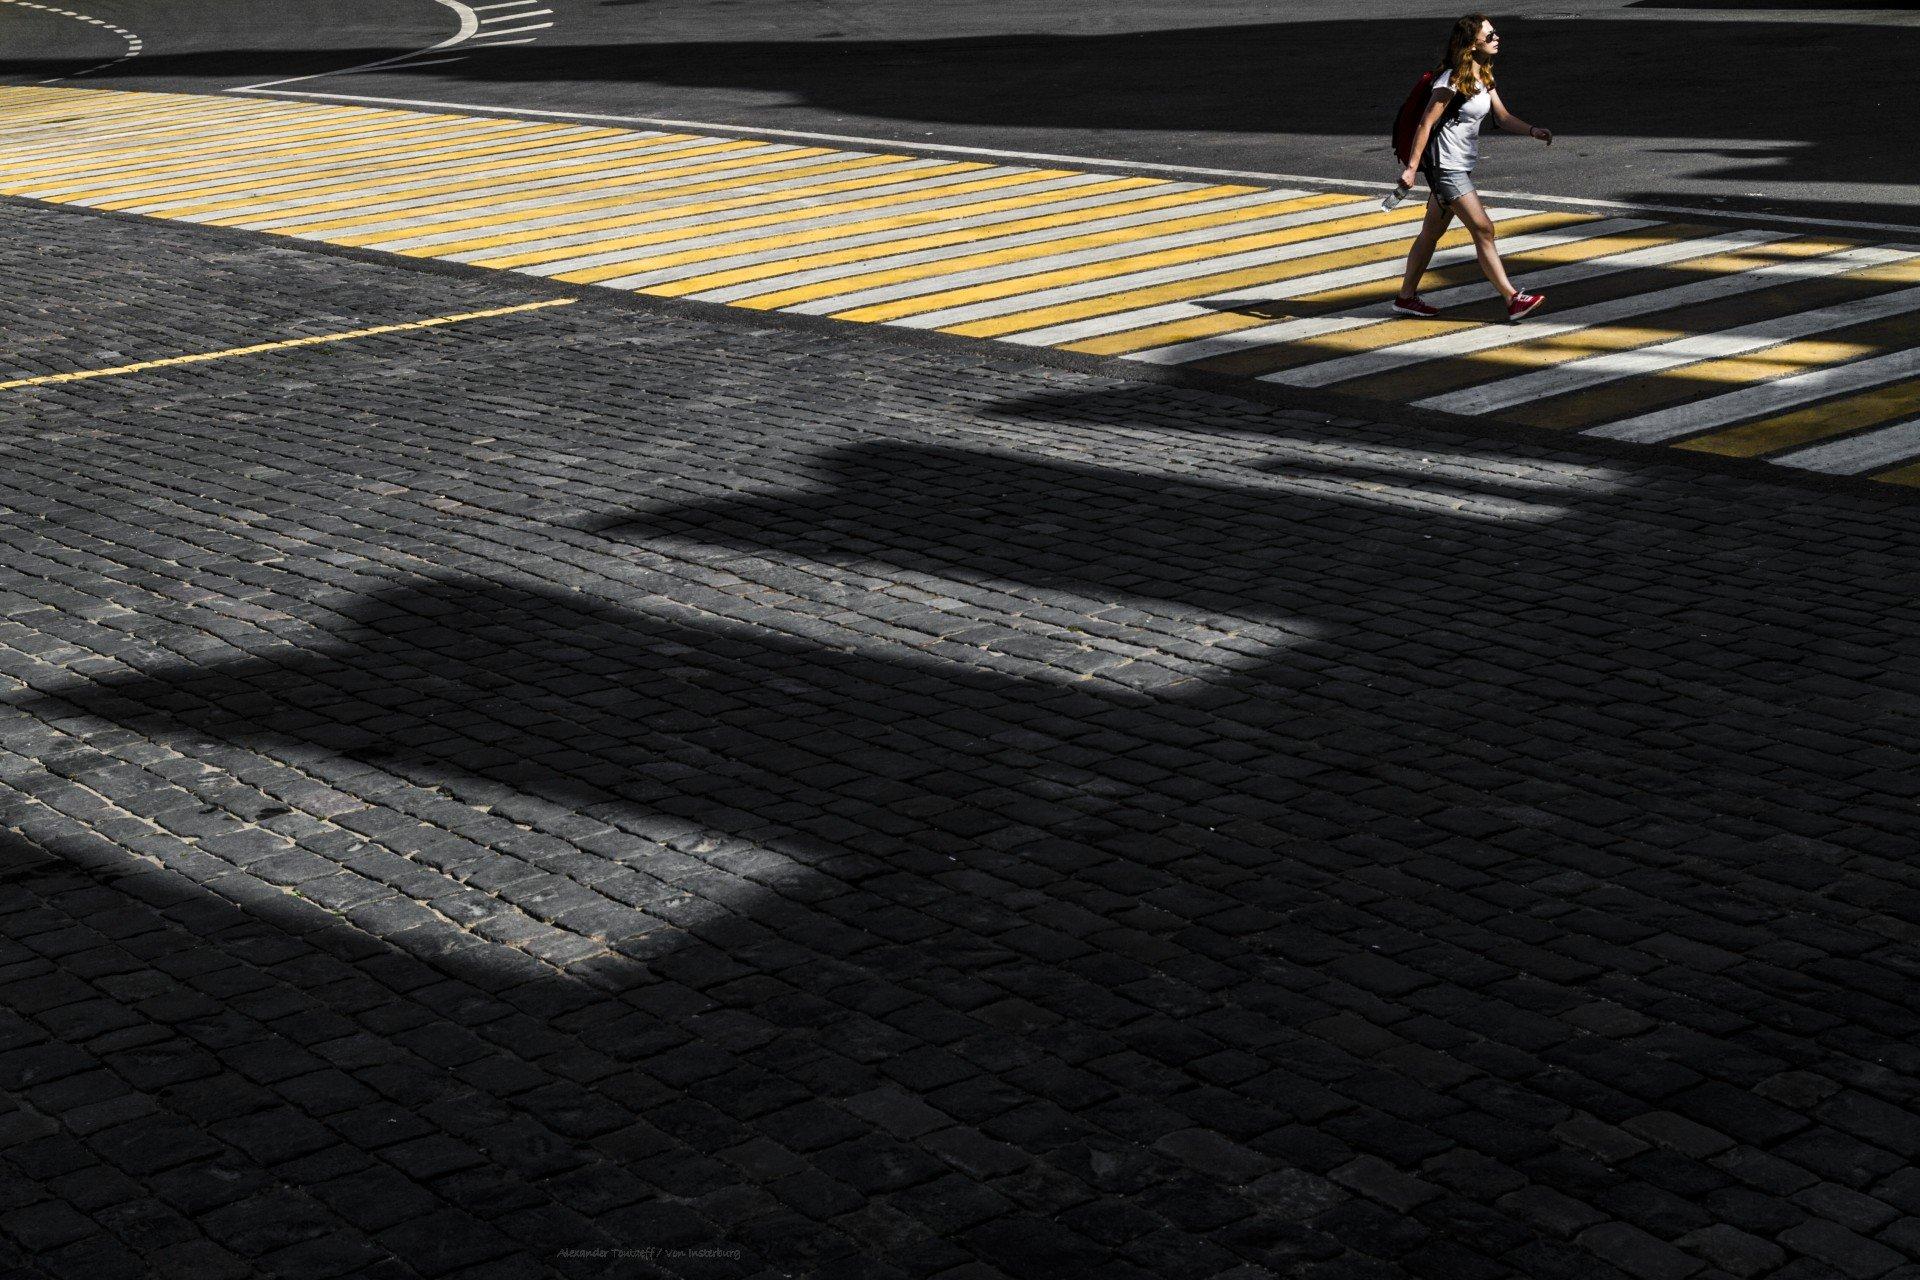 Люди, город, улица, жанр, свет, тени, переход, линии, вечер, человек, , АлександрТутаев